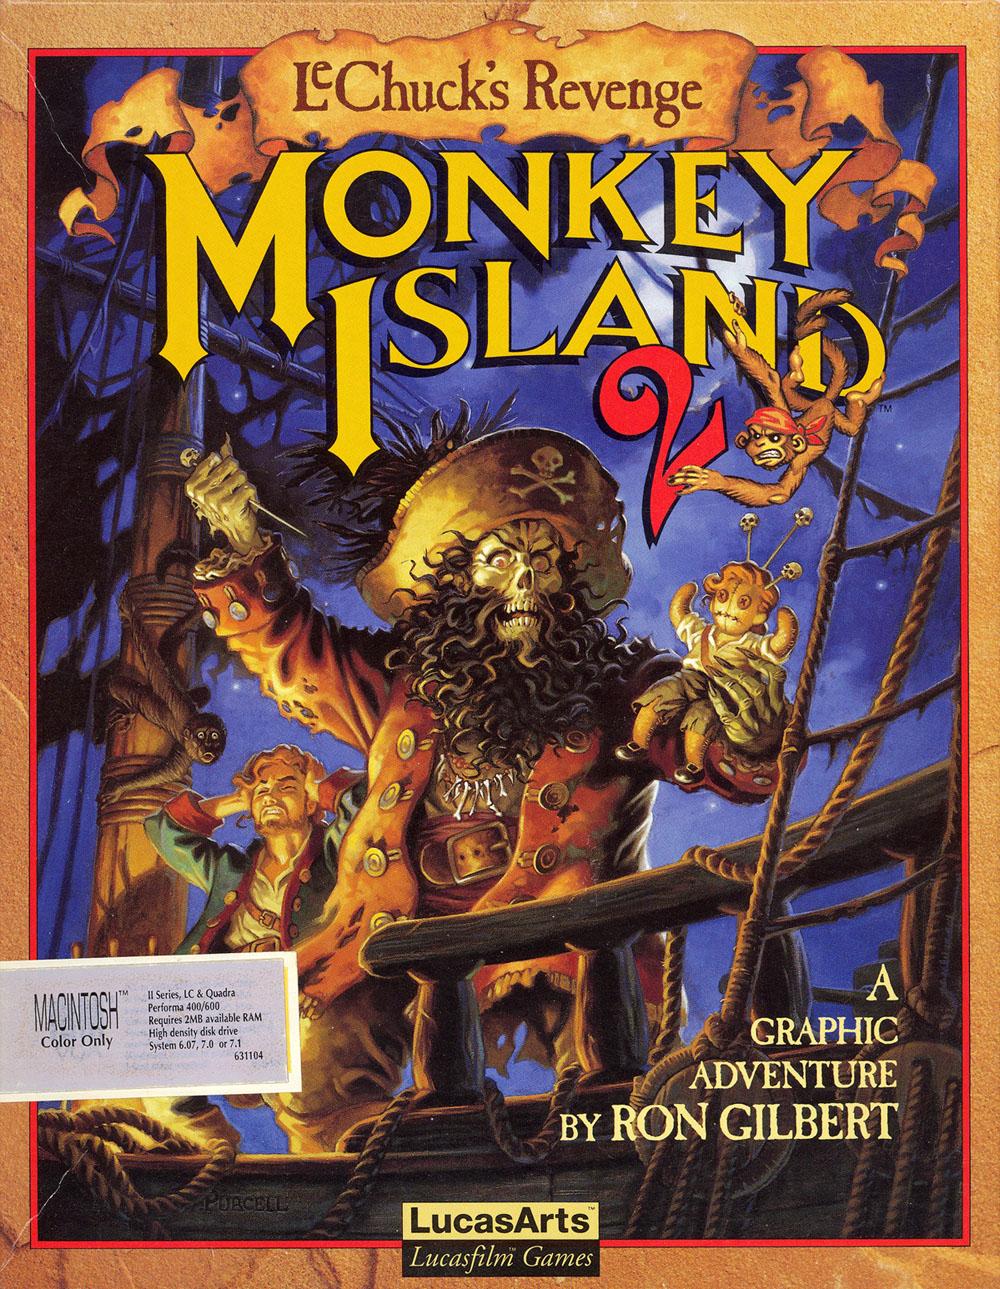 Monkeys Island Lechuck